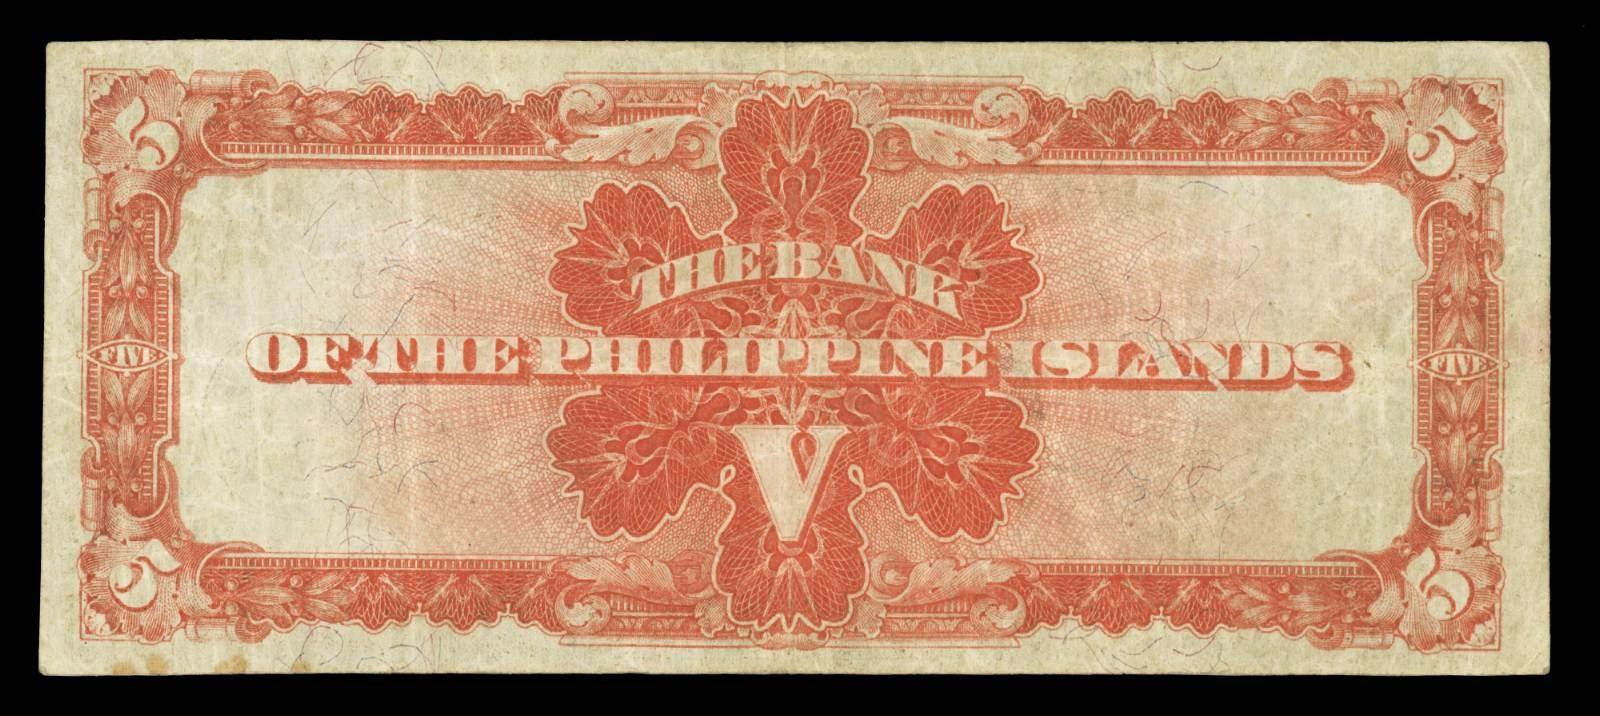 1912 5 Pesos Bank Note